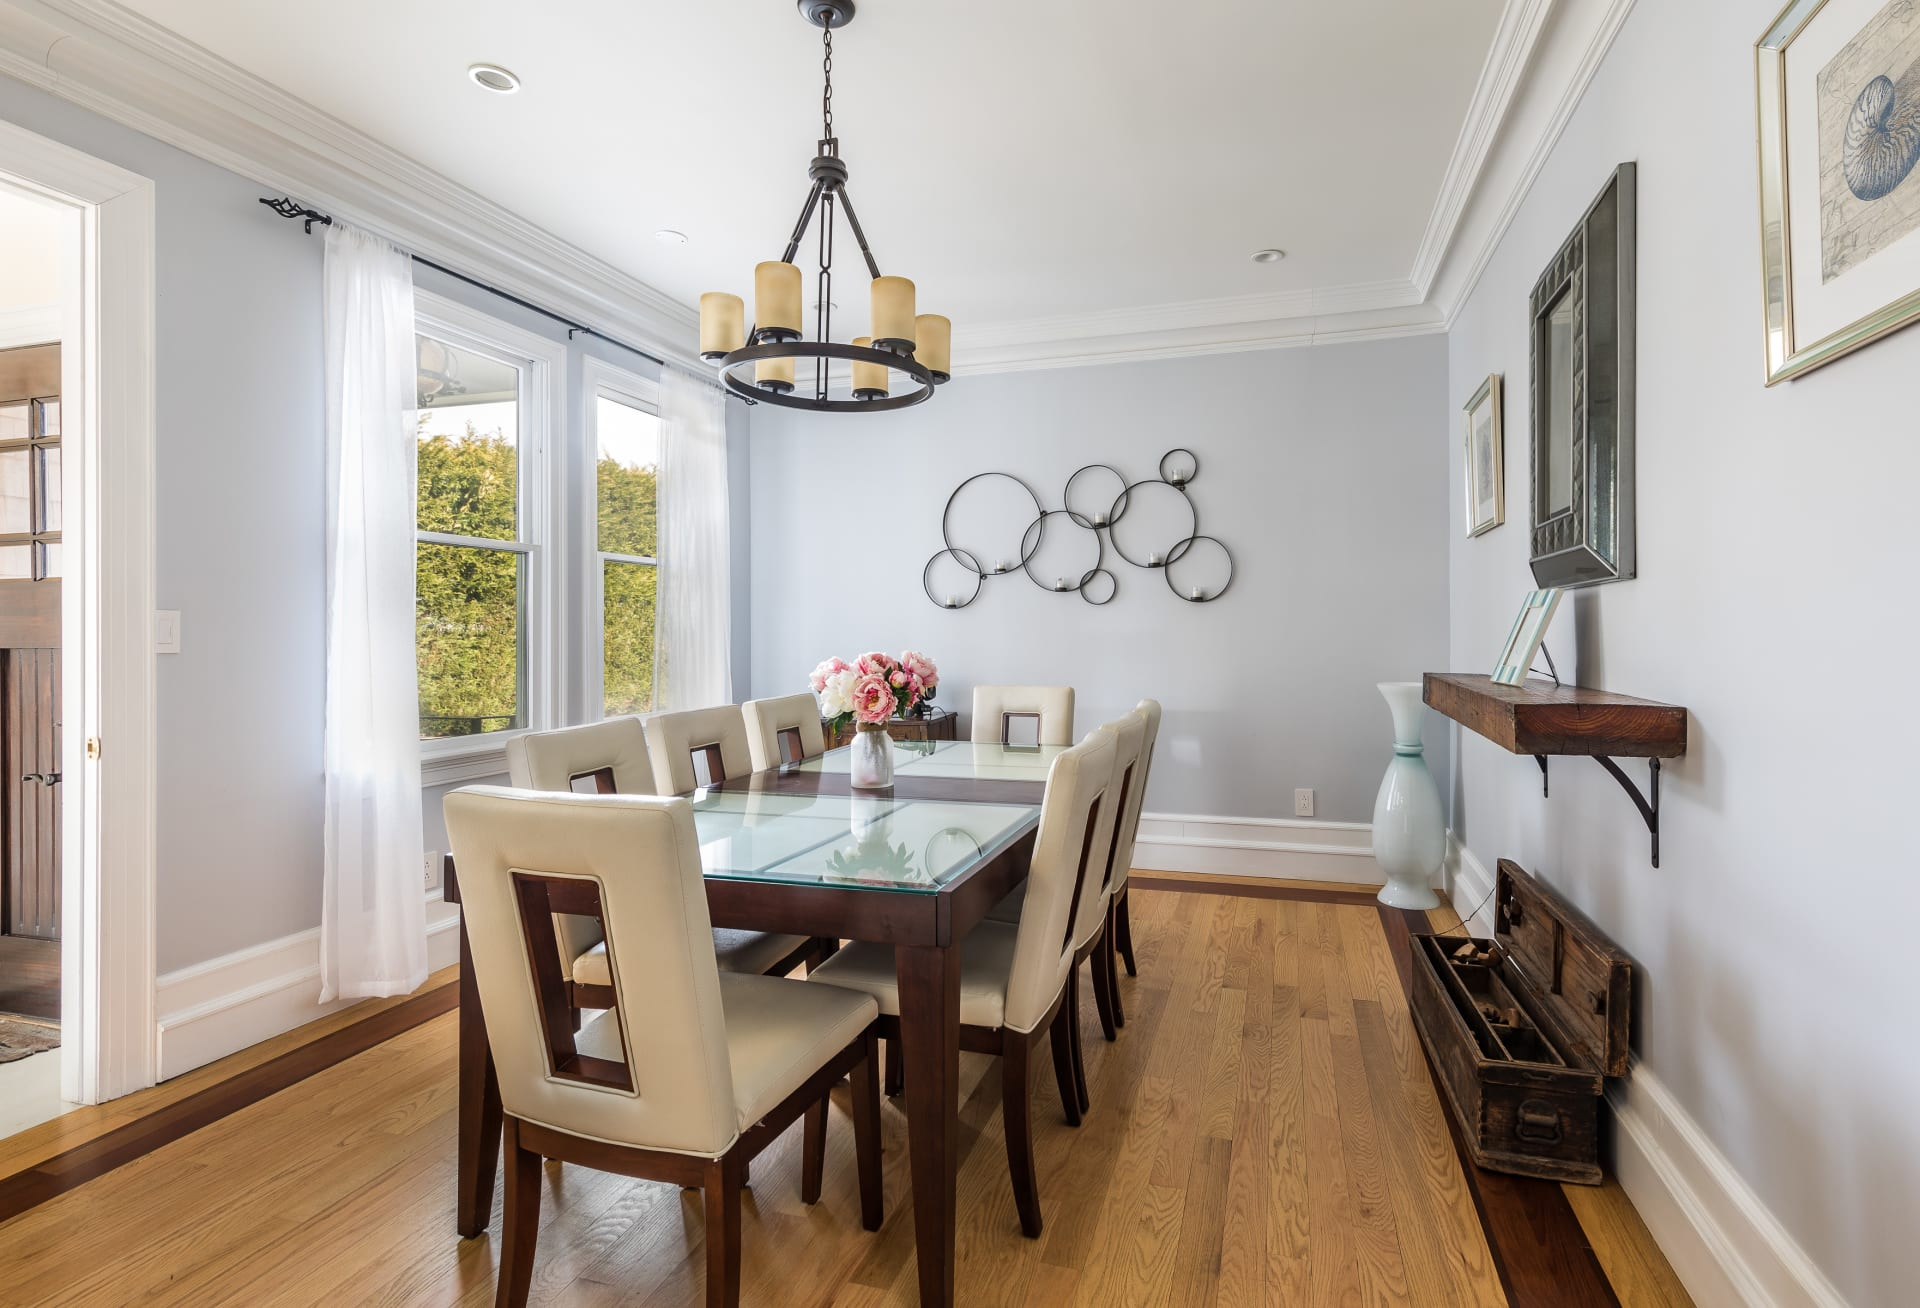 Builder's Own Custom Southampton Village Home